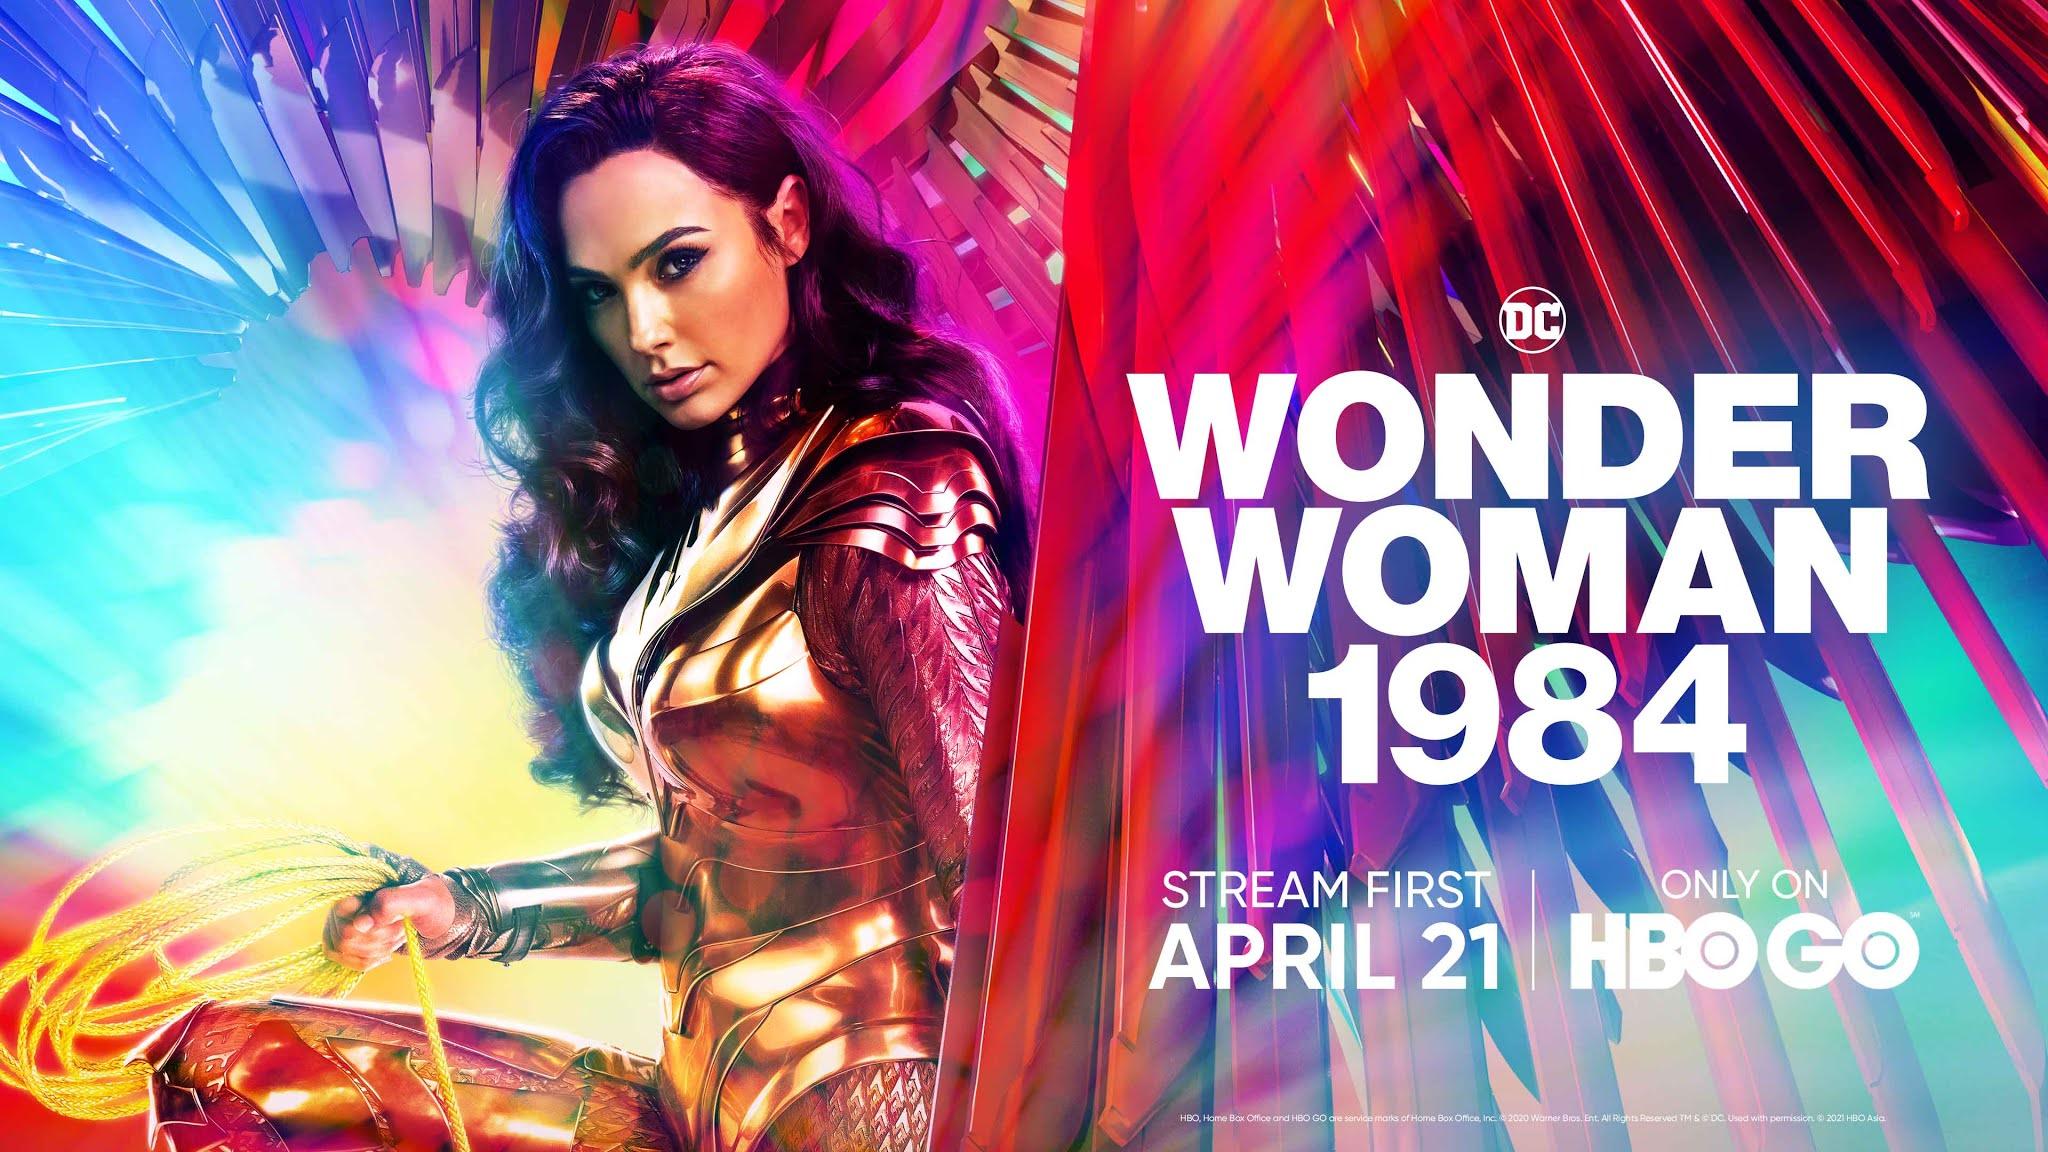 Wonder Woman 1984 HBO GO